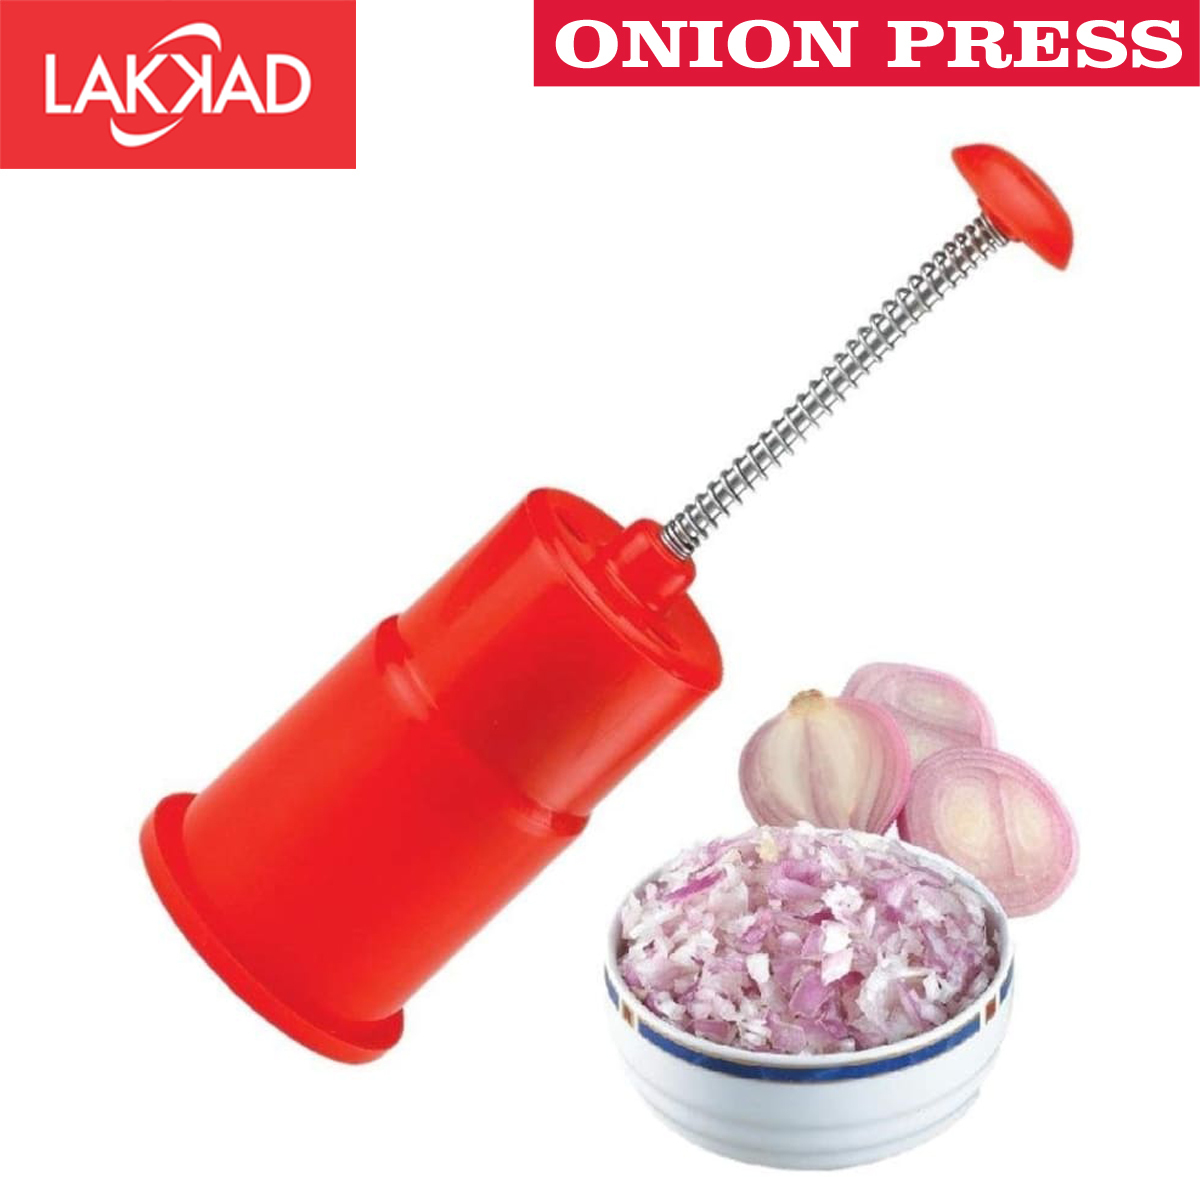 Onion Press